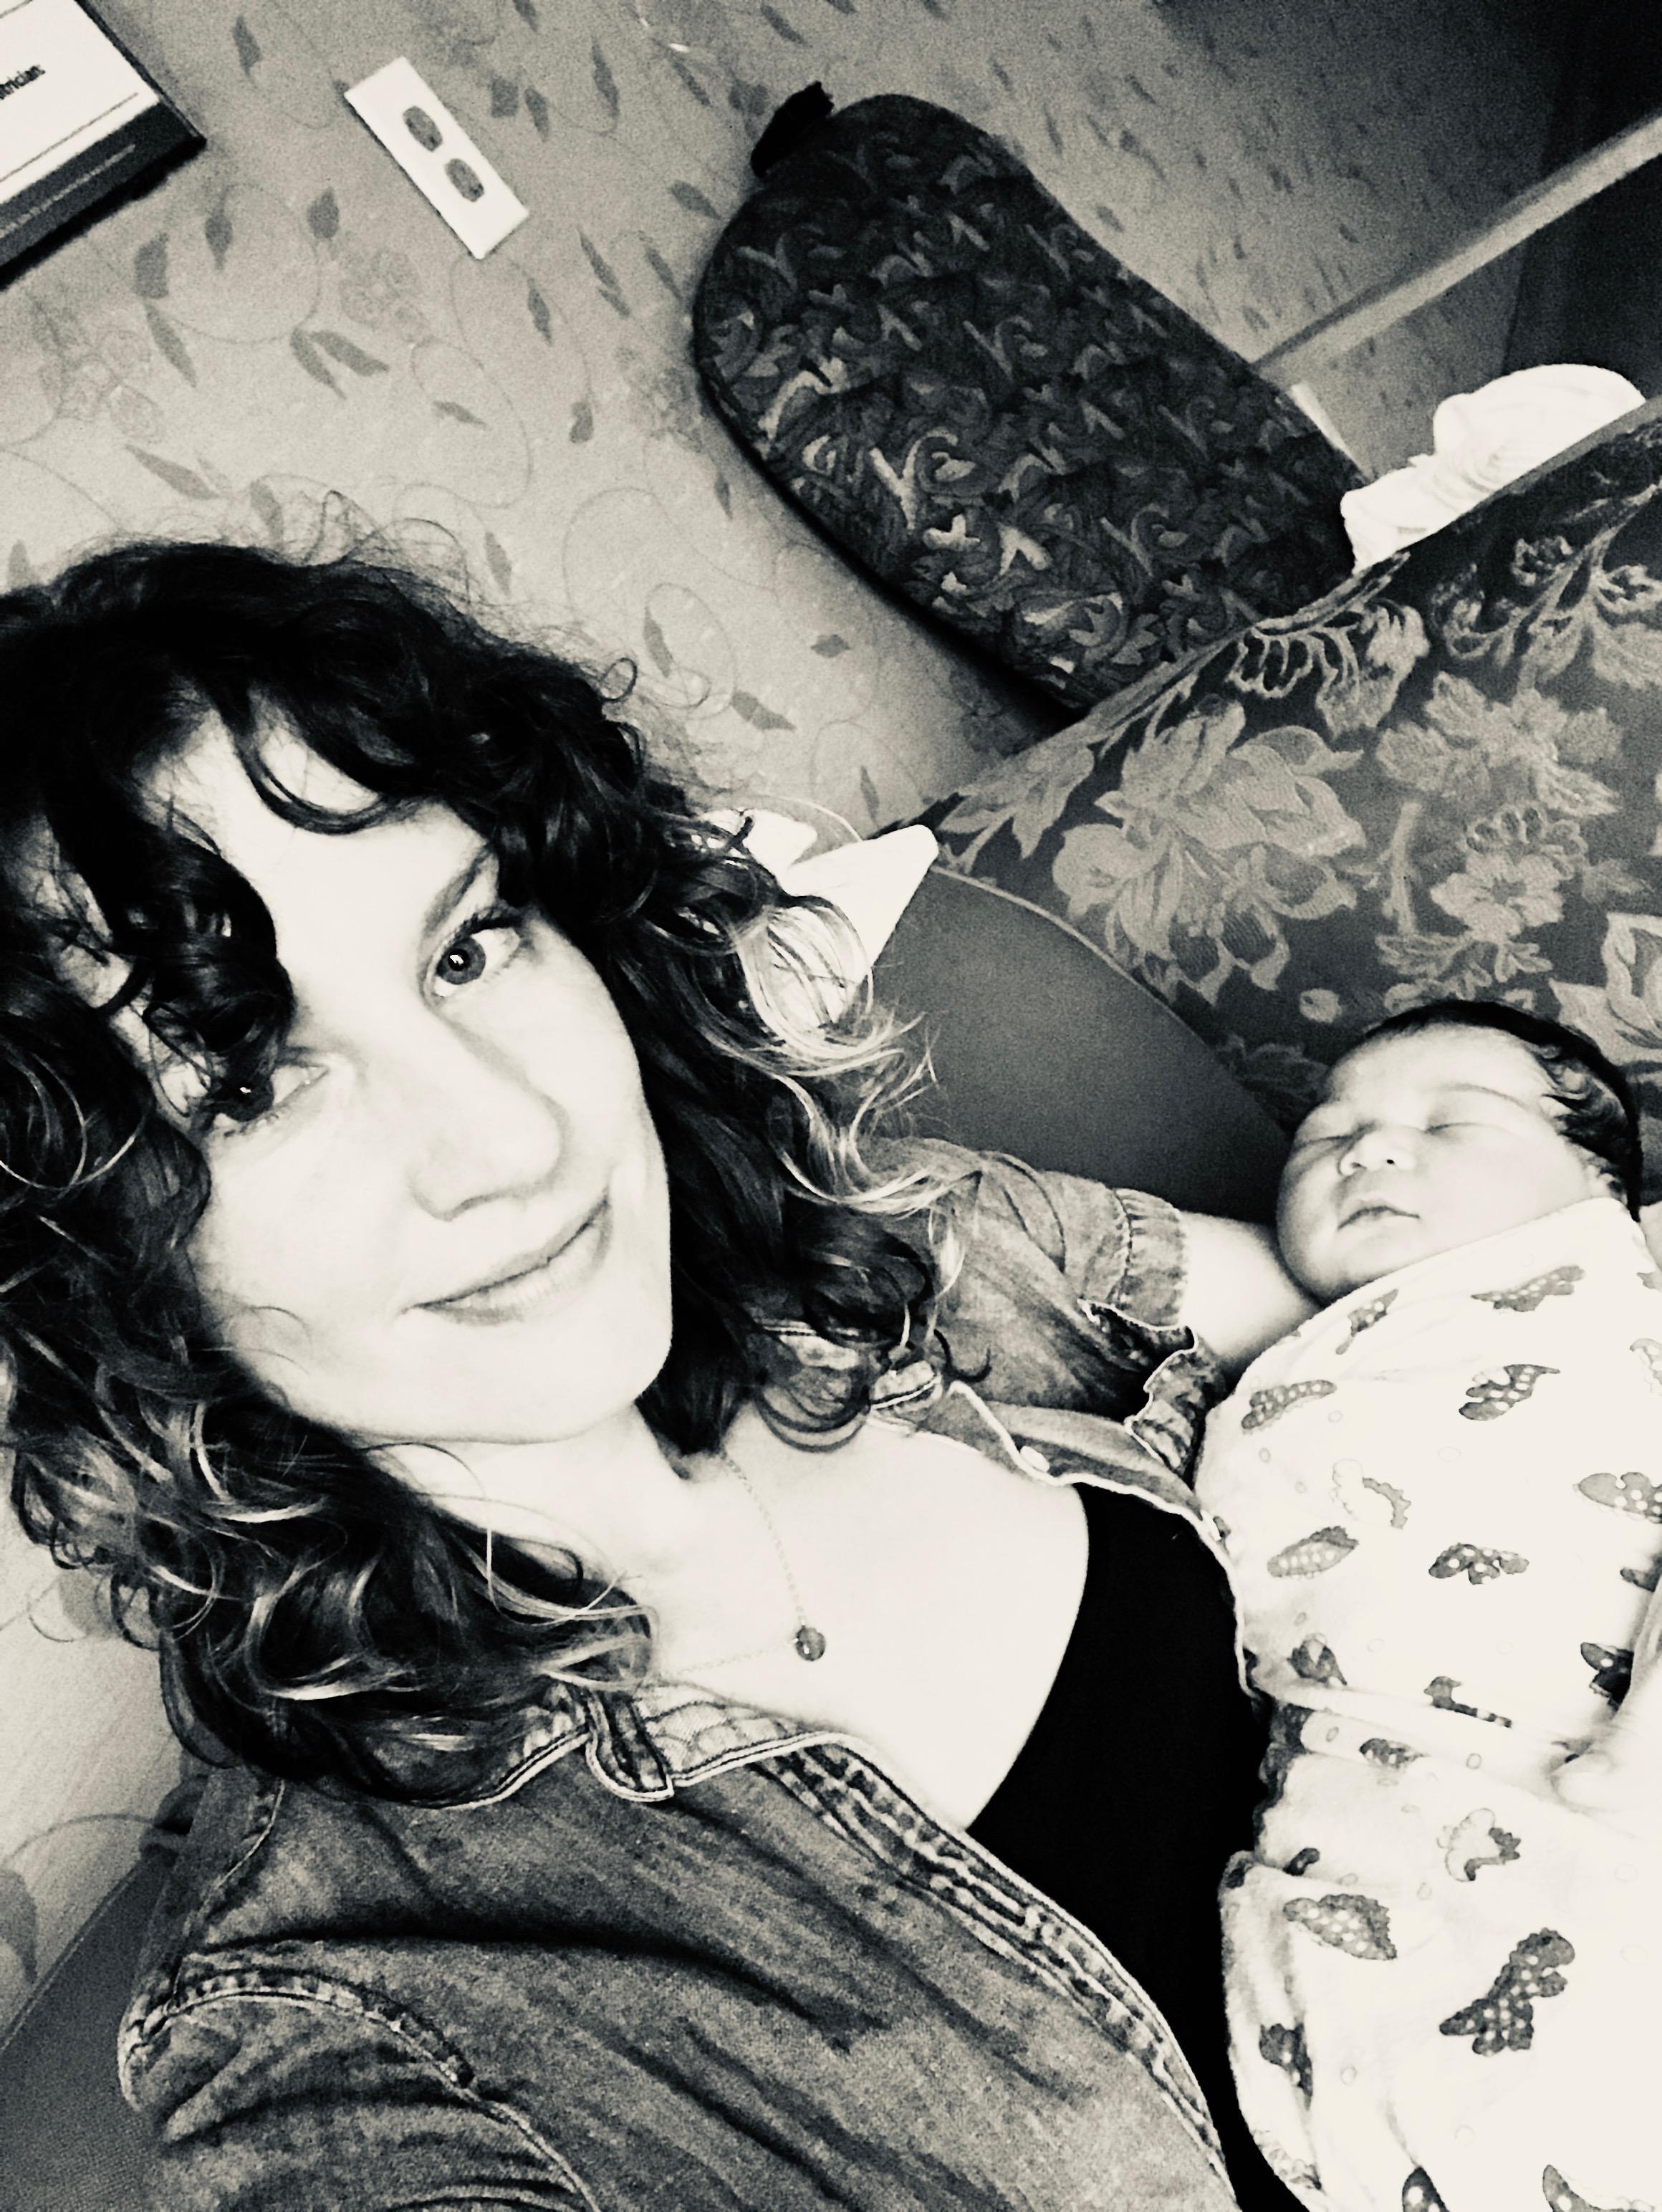 Sierra holding the newborn Naomi